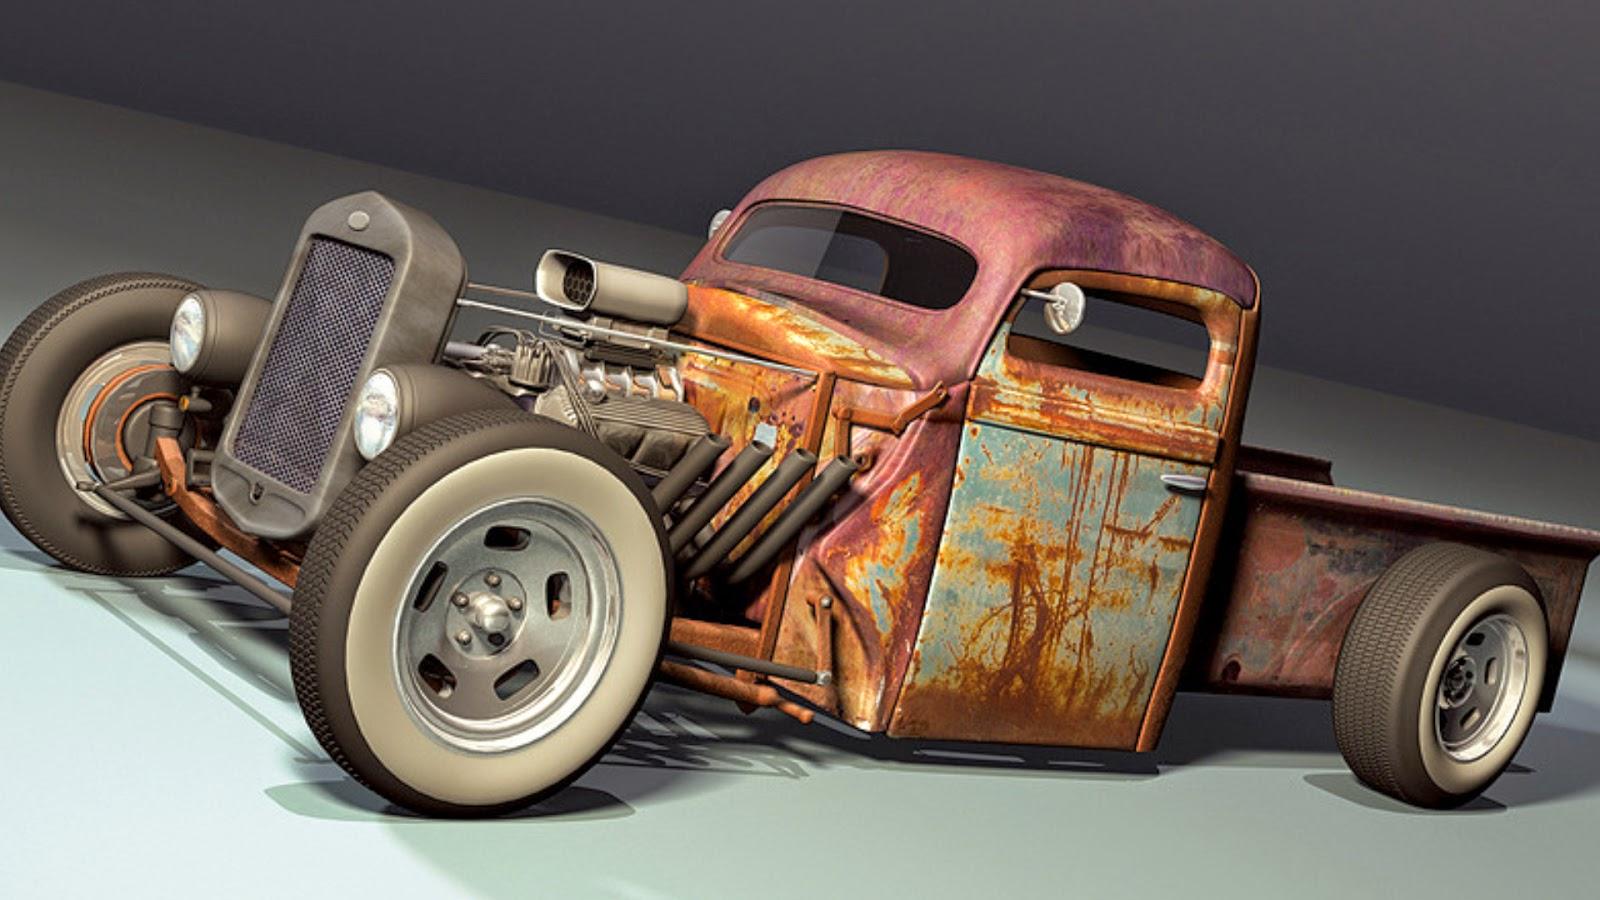 rat rod cars best - photo #32